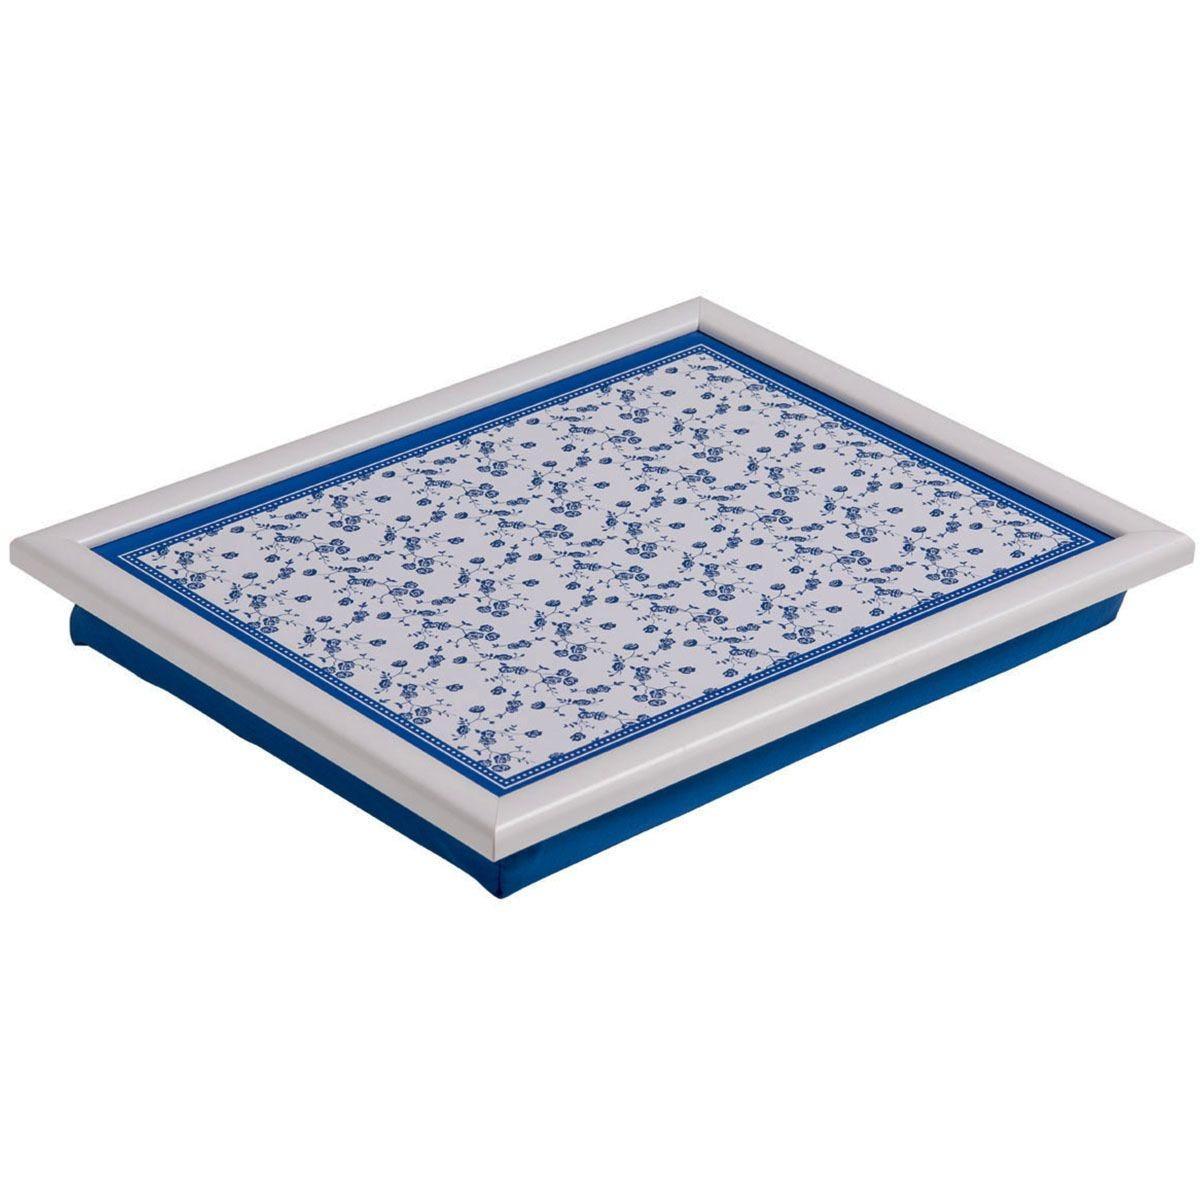 Premier Housewares Rose Lap Tray - Blue